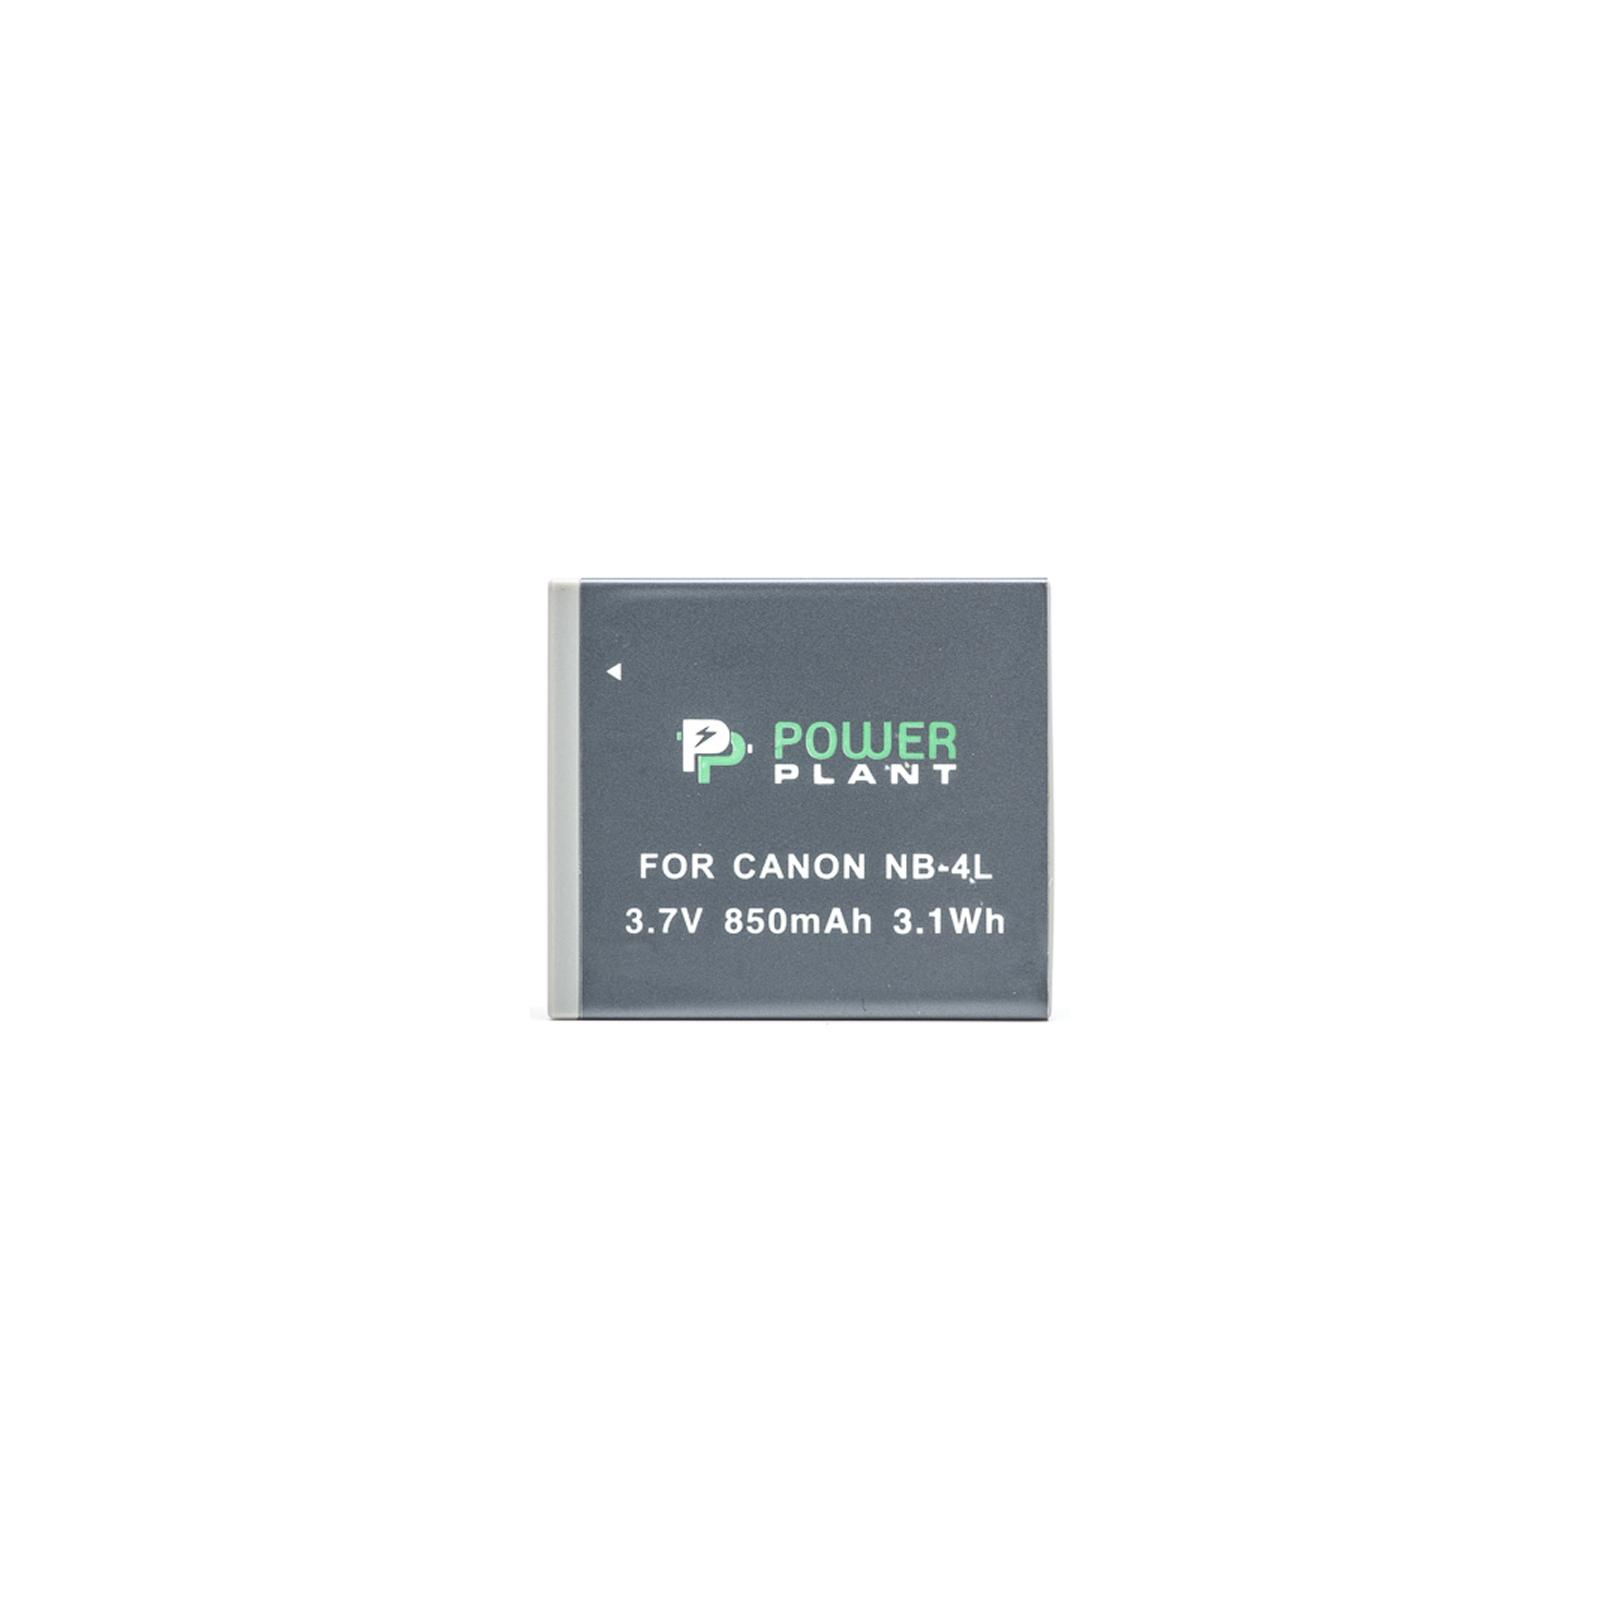 Аккумулятор к фото/видео PowerPlant Canon NB-4L (DV00DV1006) изображение 2